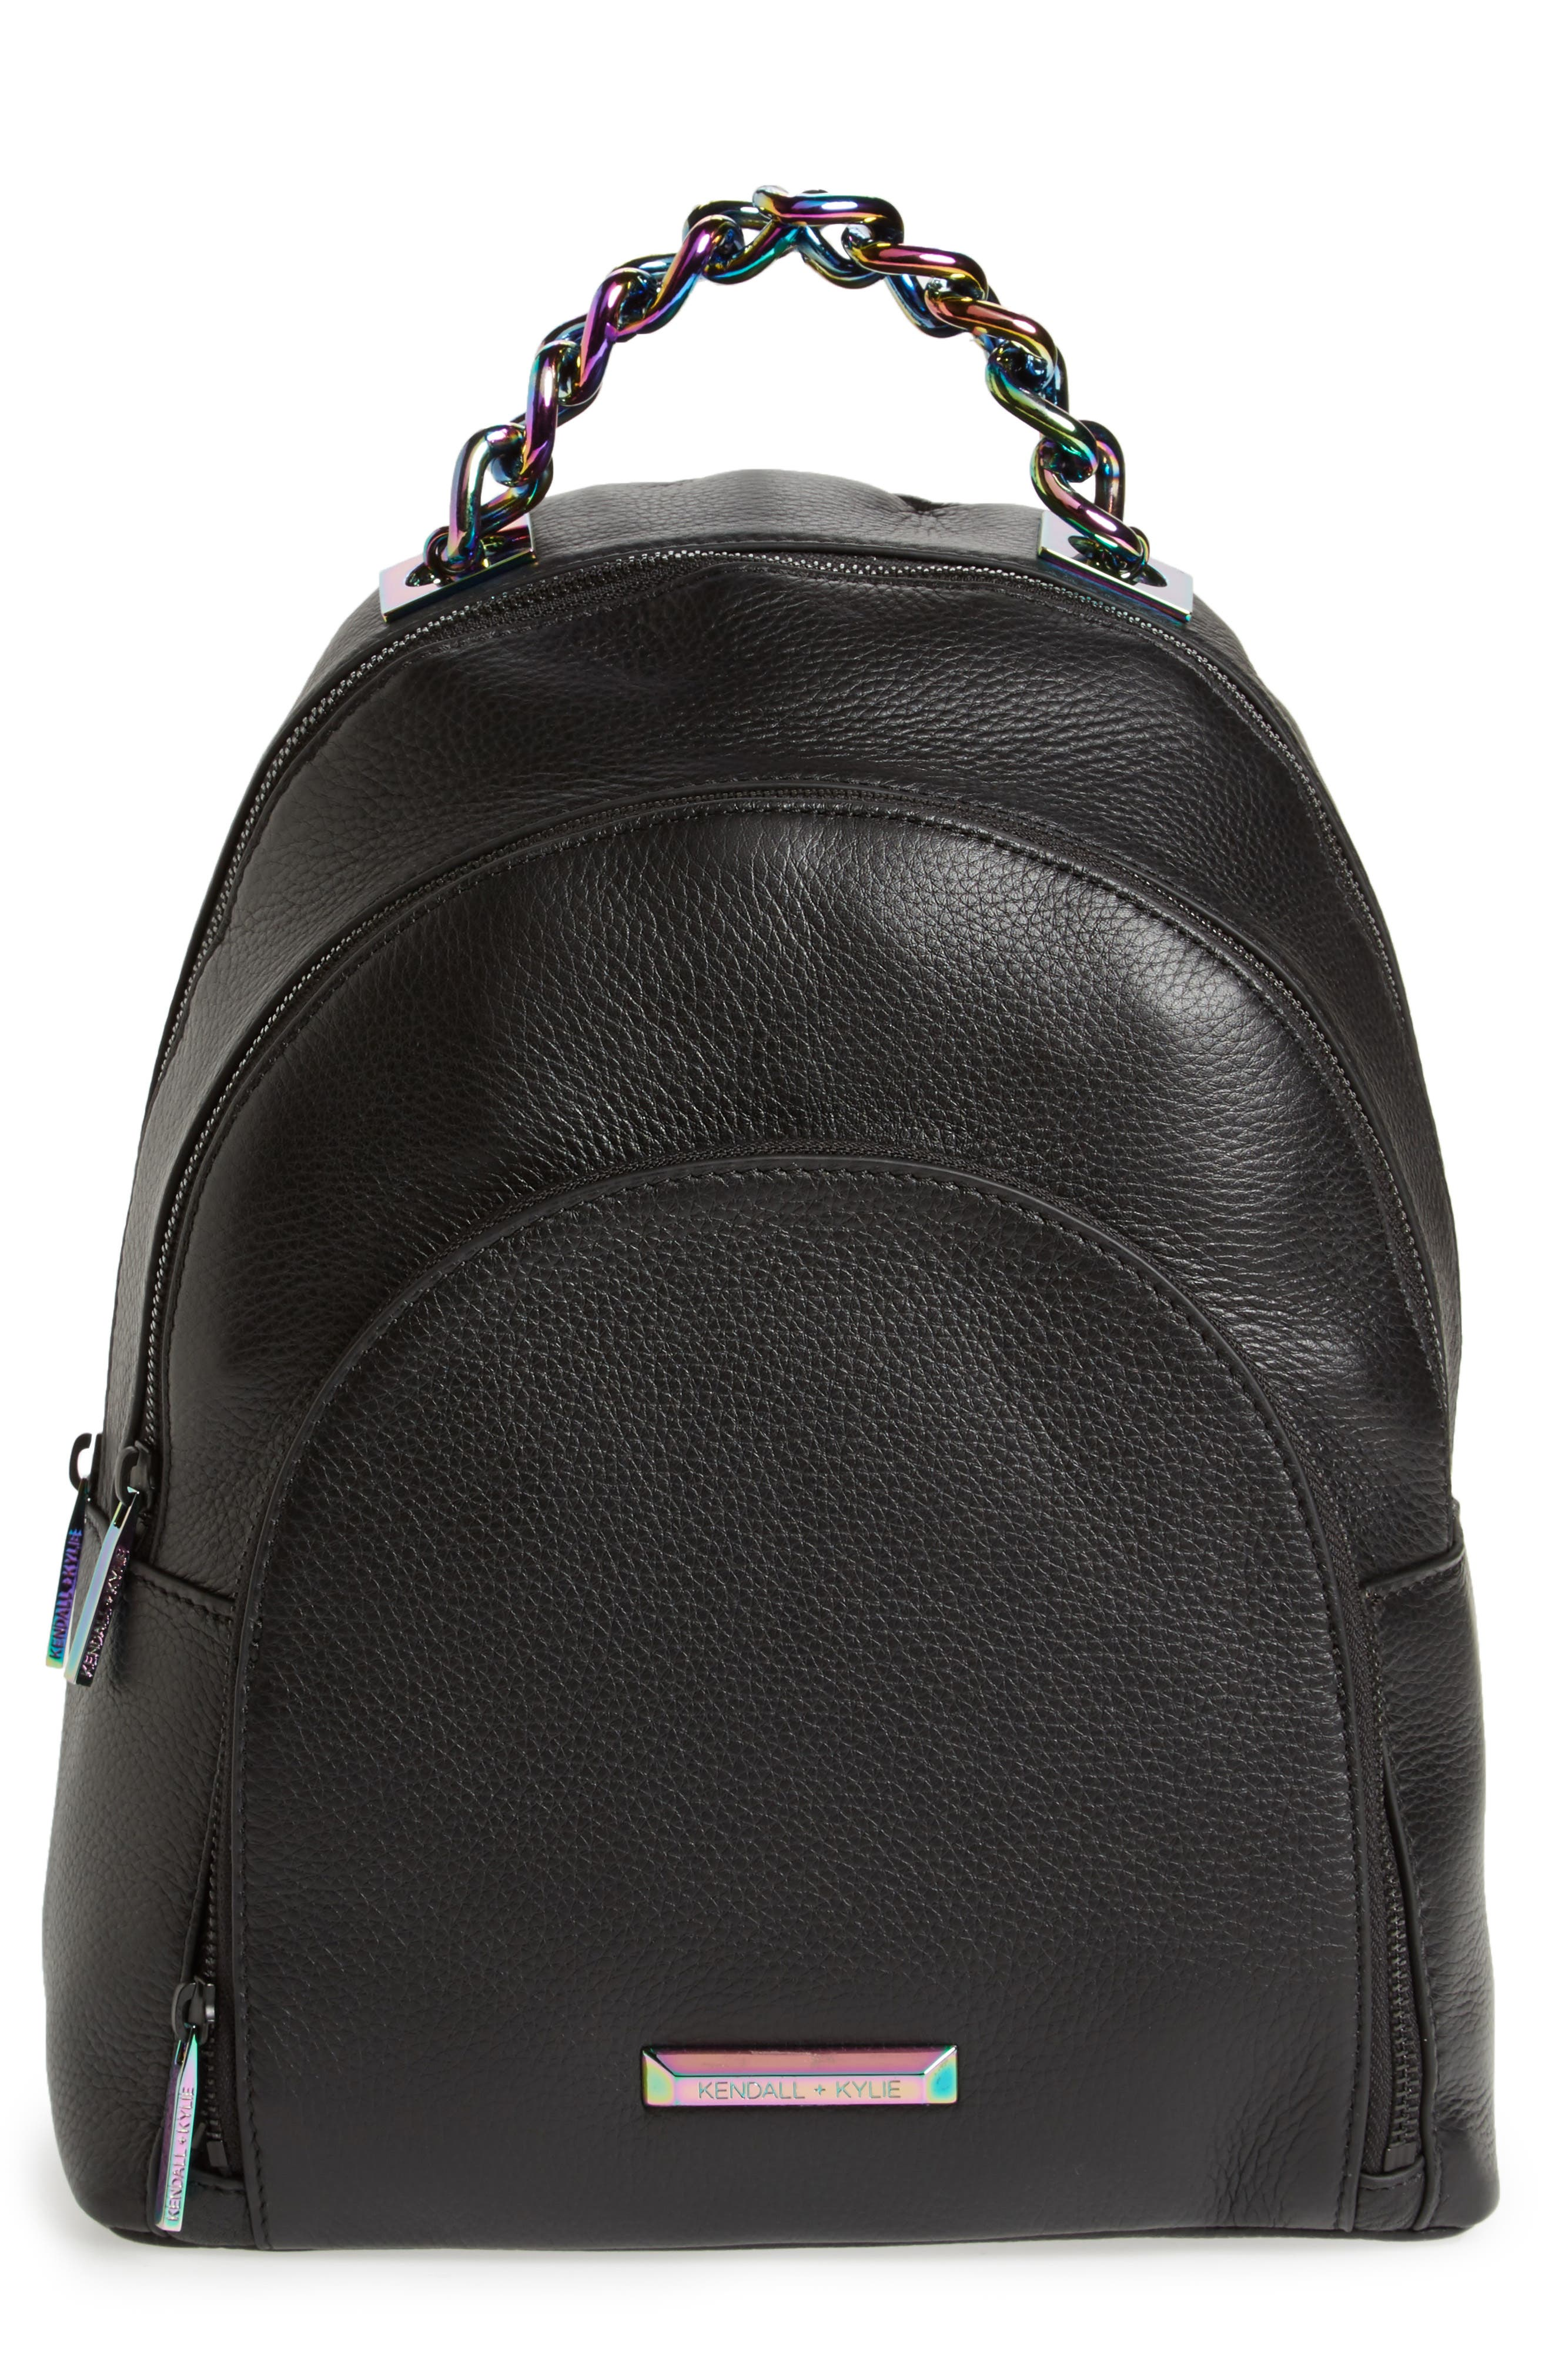 Sloane Iridescent Hardware Leather Backpack,                             Main thumbnail 1, color,